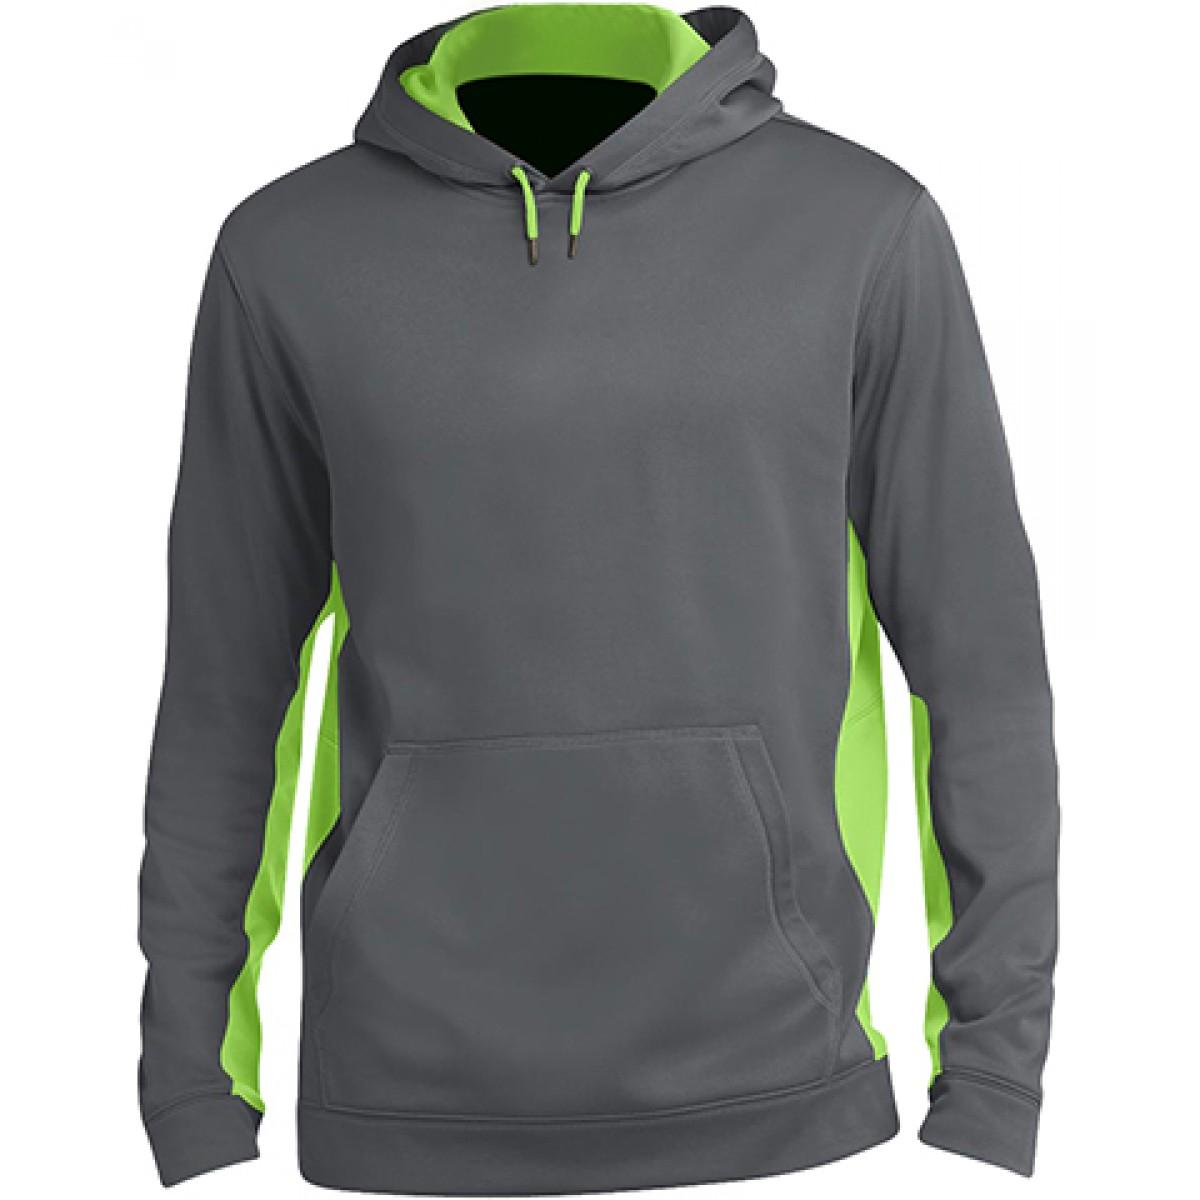 Fleece Colorblock Hooded Pullover-Gray/Green-3XL